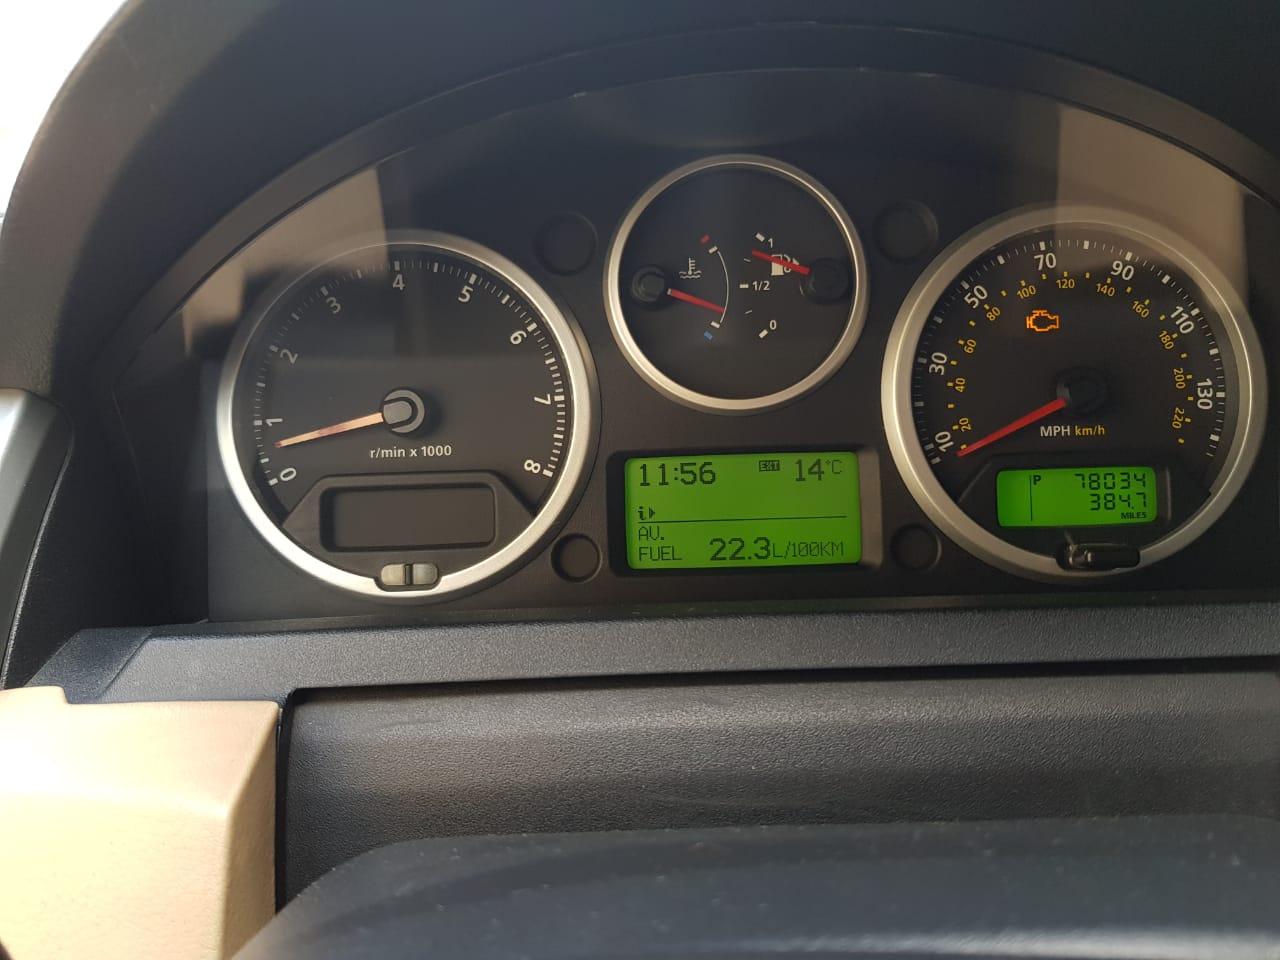 Land Rover Range Rover Sport 4.2(lt) 2008 İkinci əl  $19900